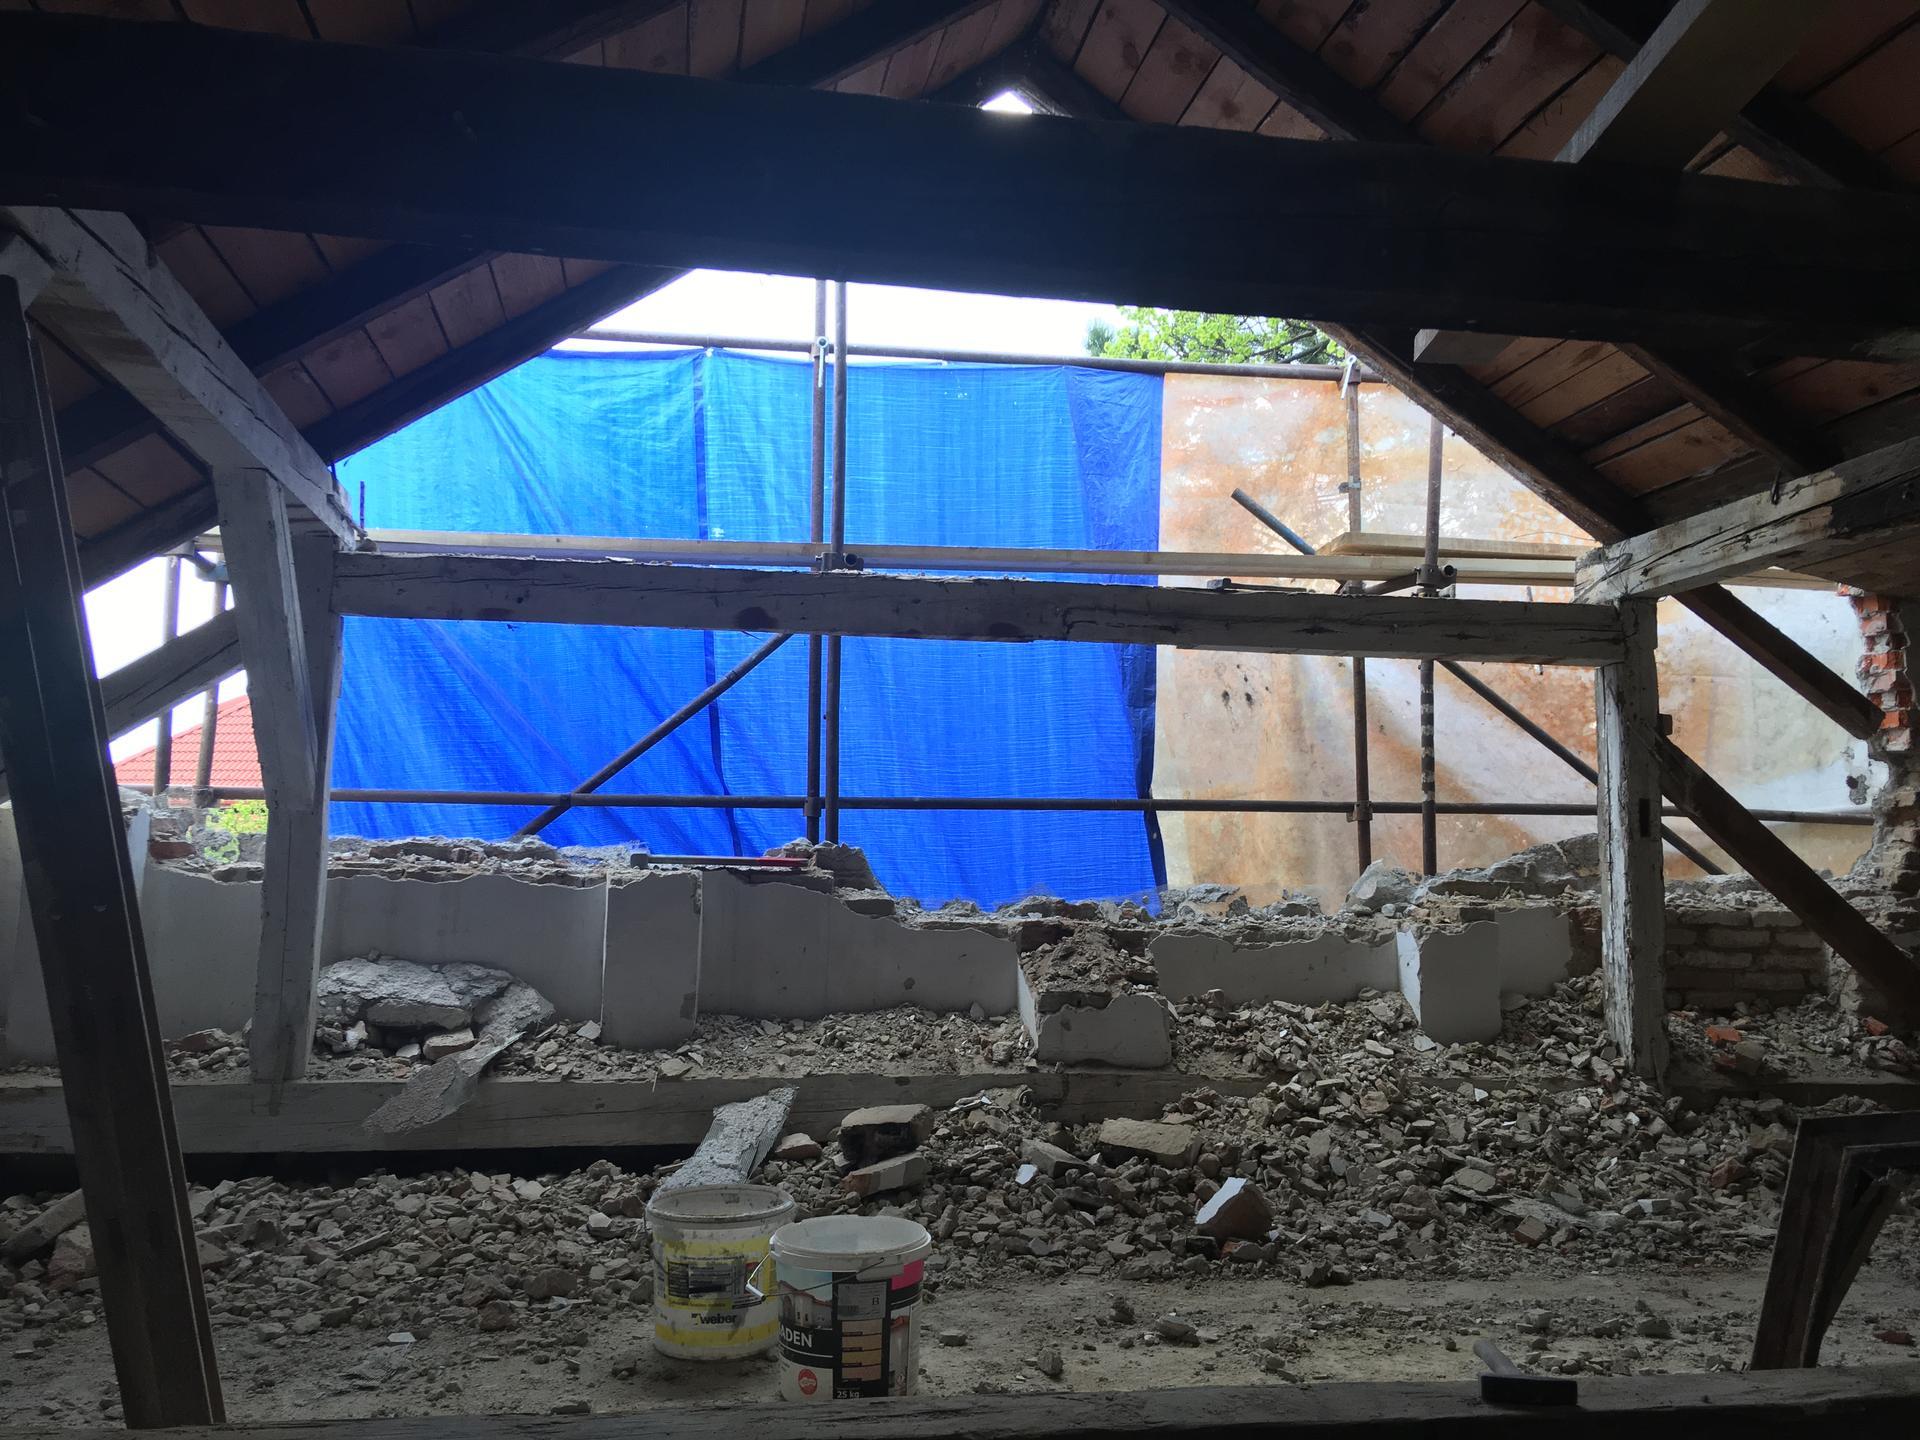 Prestavba podkrovia zo sedlovo valbovej na sedlovú strechu. - Obrázok č. 54